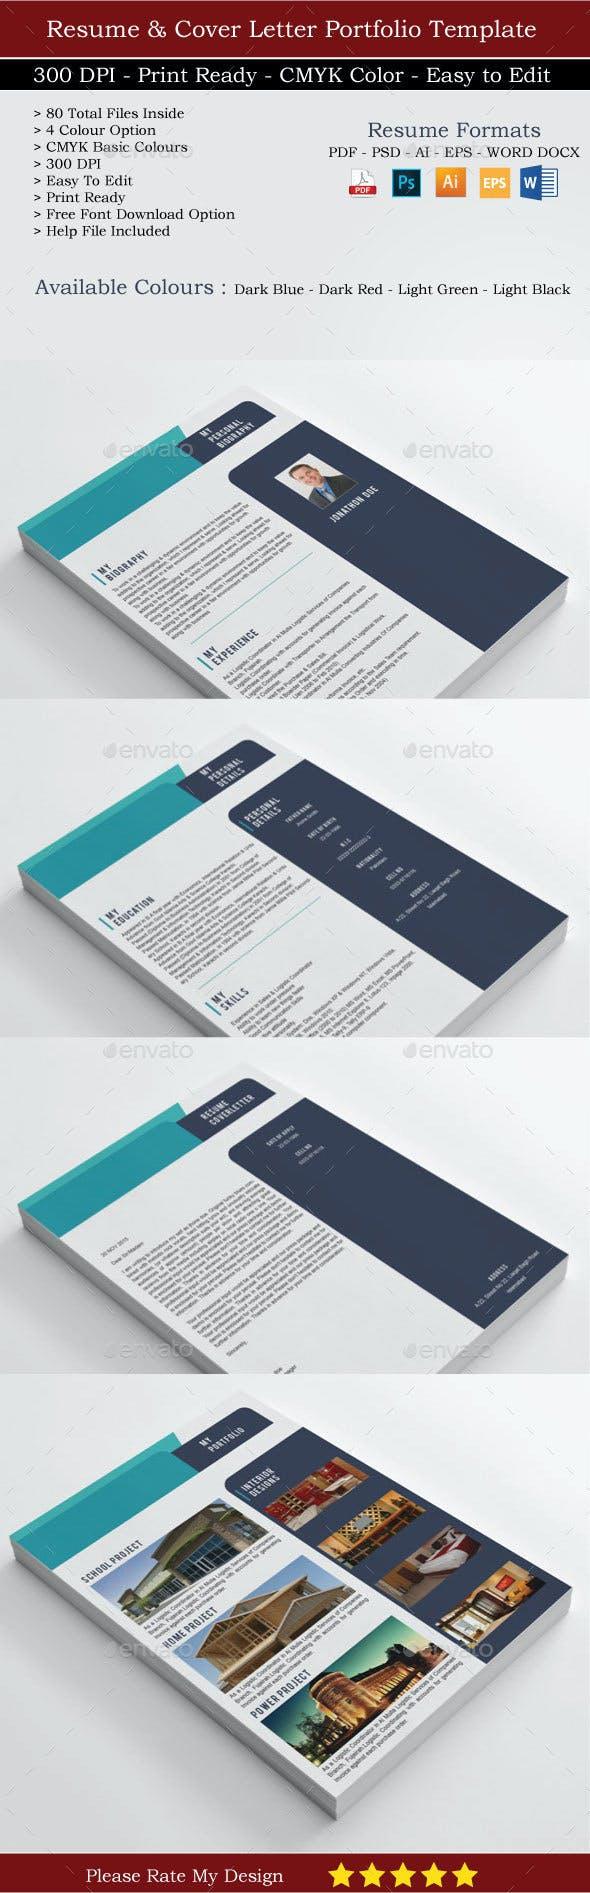 Resume and Cover letter Portfolio by shujaktk   GraphicRiver